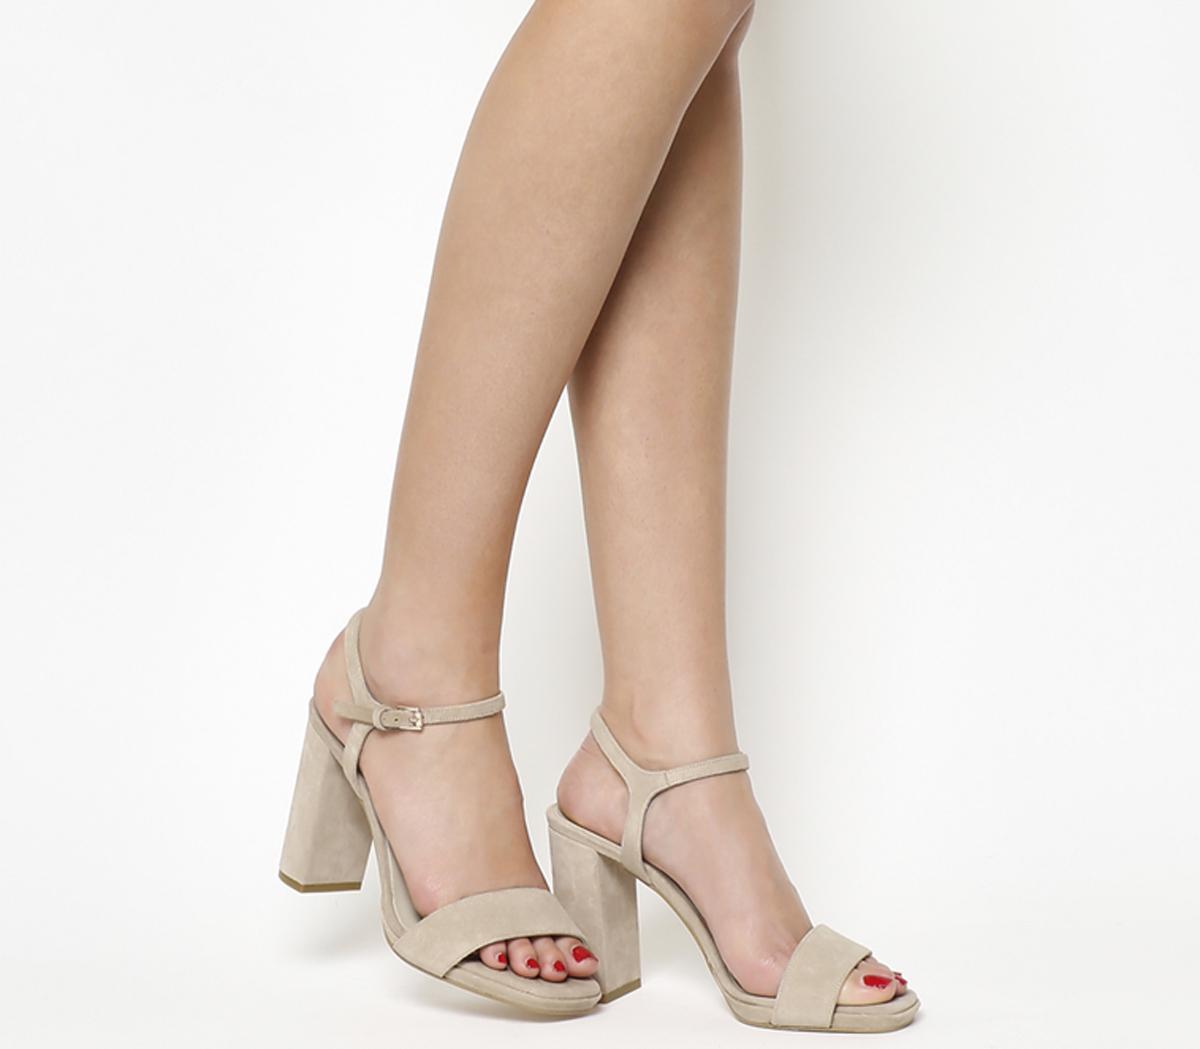 Hazzard Slim Platform Sandals